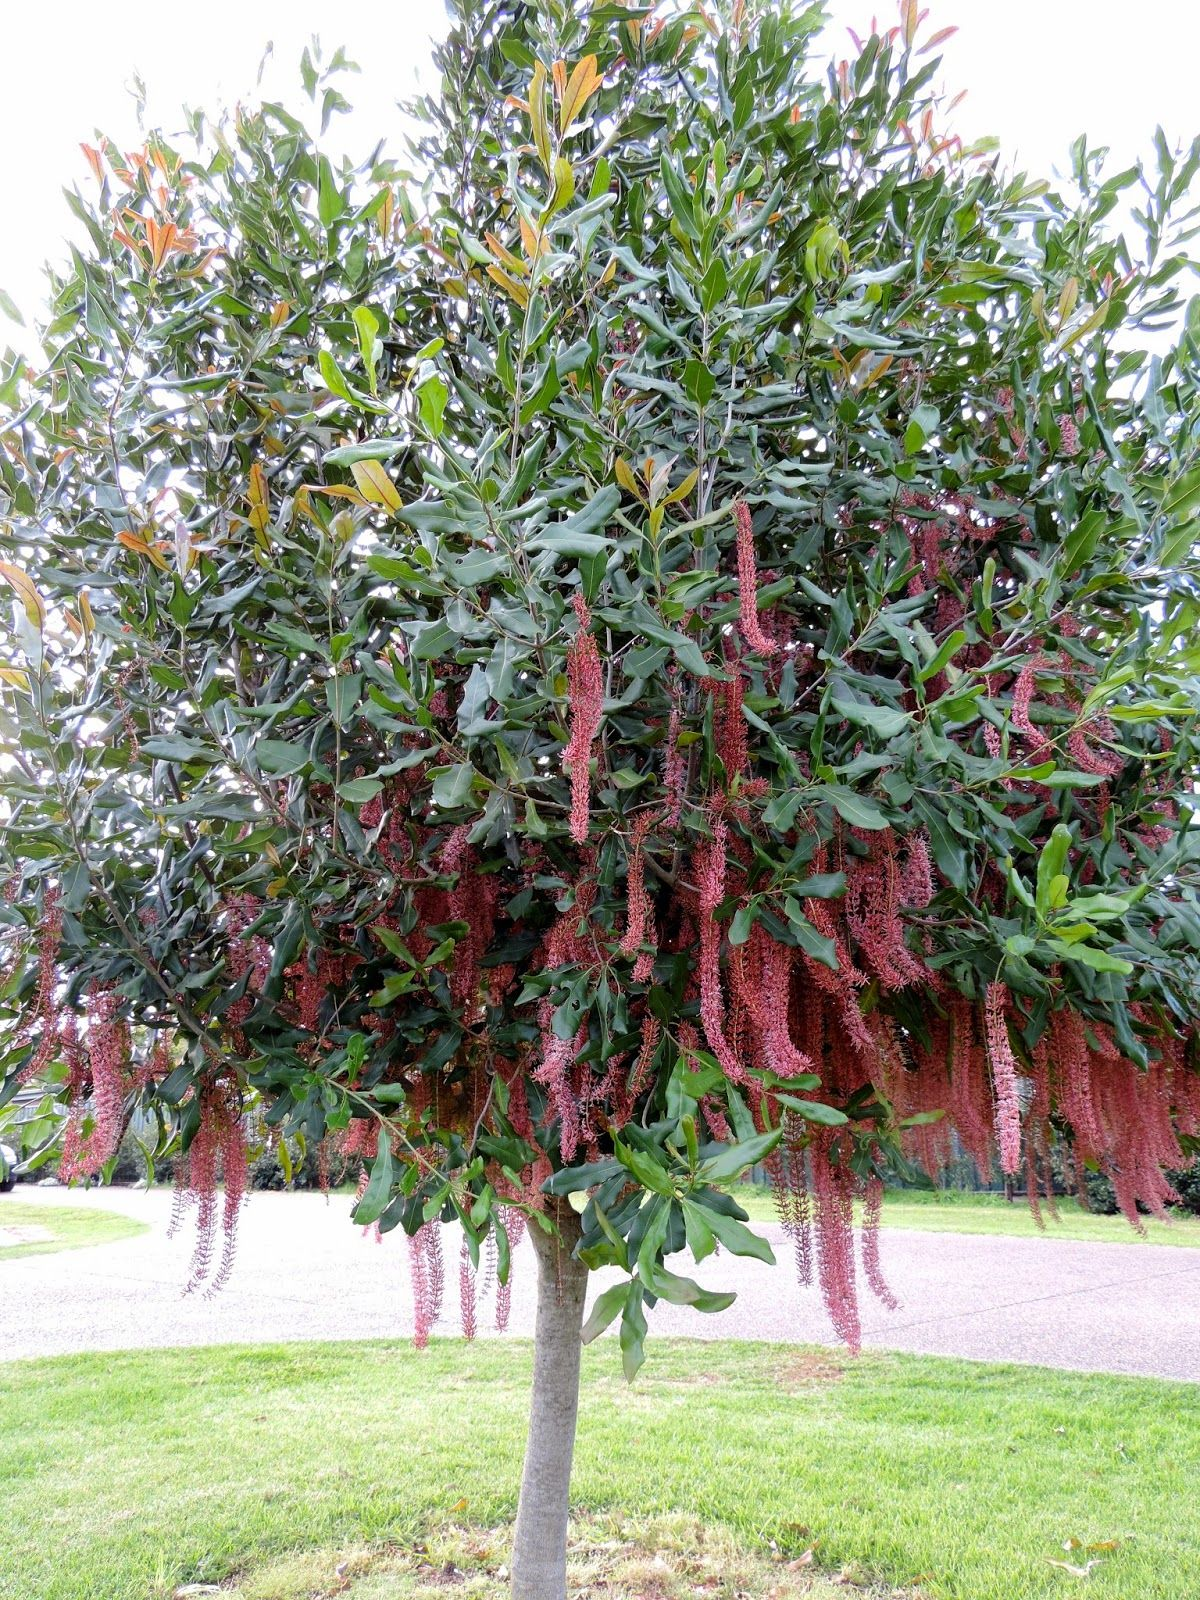 Pinkalicious Macadamia Tree Grows Well In Willunga A Fruit Tree Colourful Flowers Strong Single Fruit Tree Garden Australian Garden Native Plant Gardening